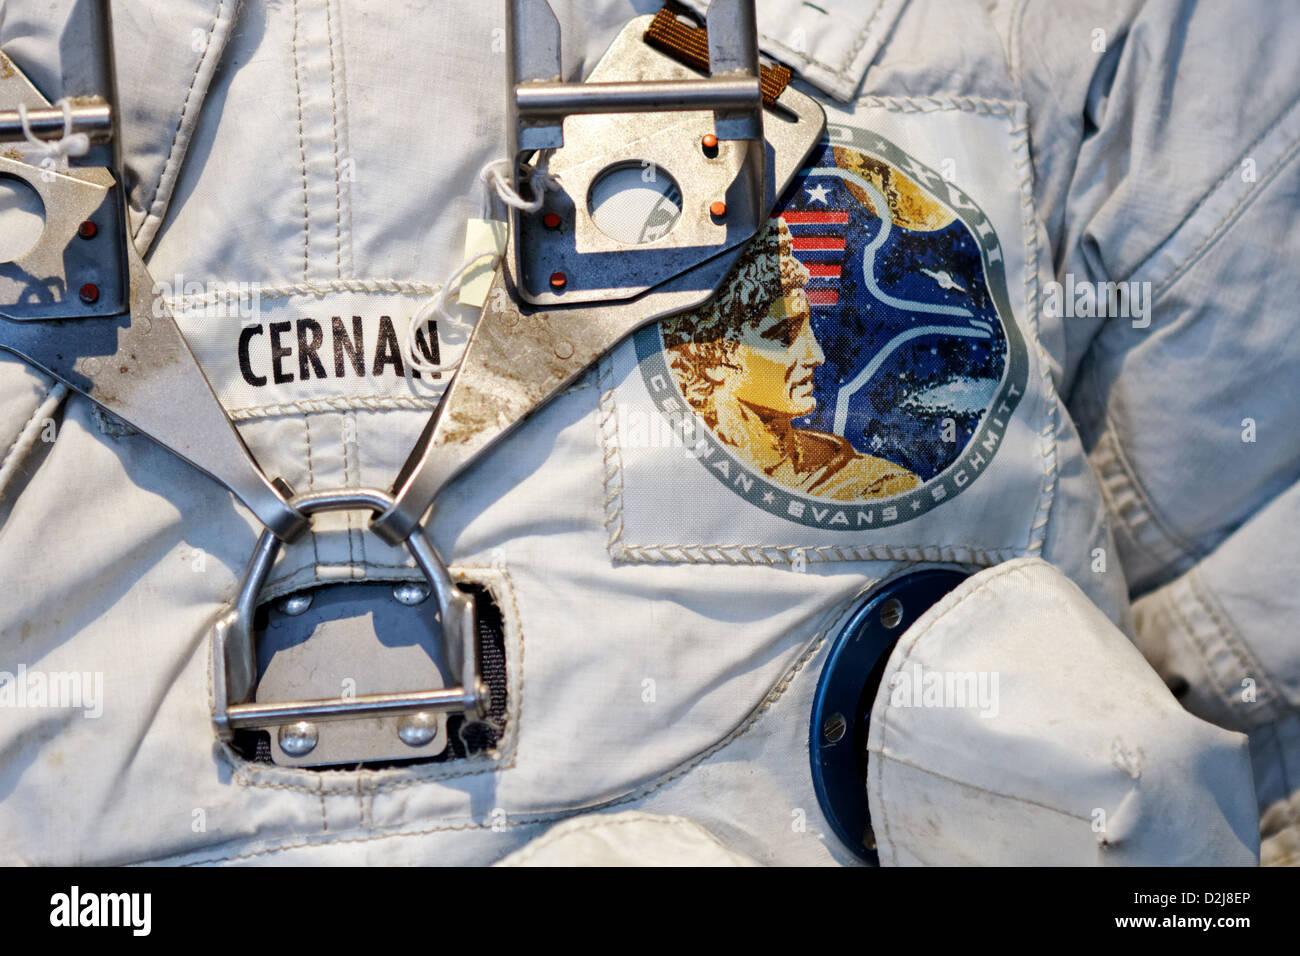 Gene Cernan Apollo 17 suit, Kennedy Space Center - Stock Image